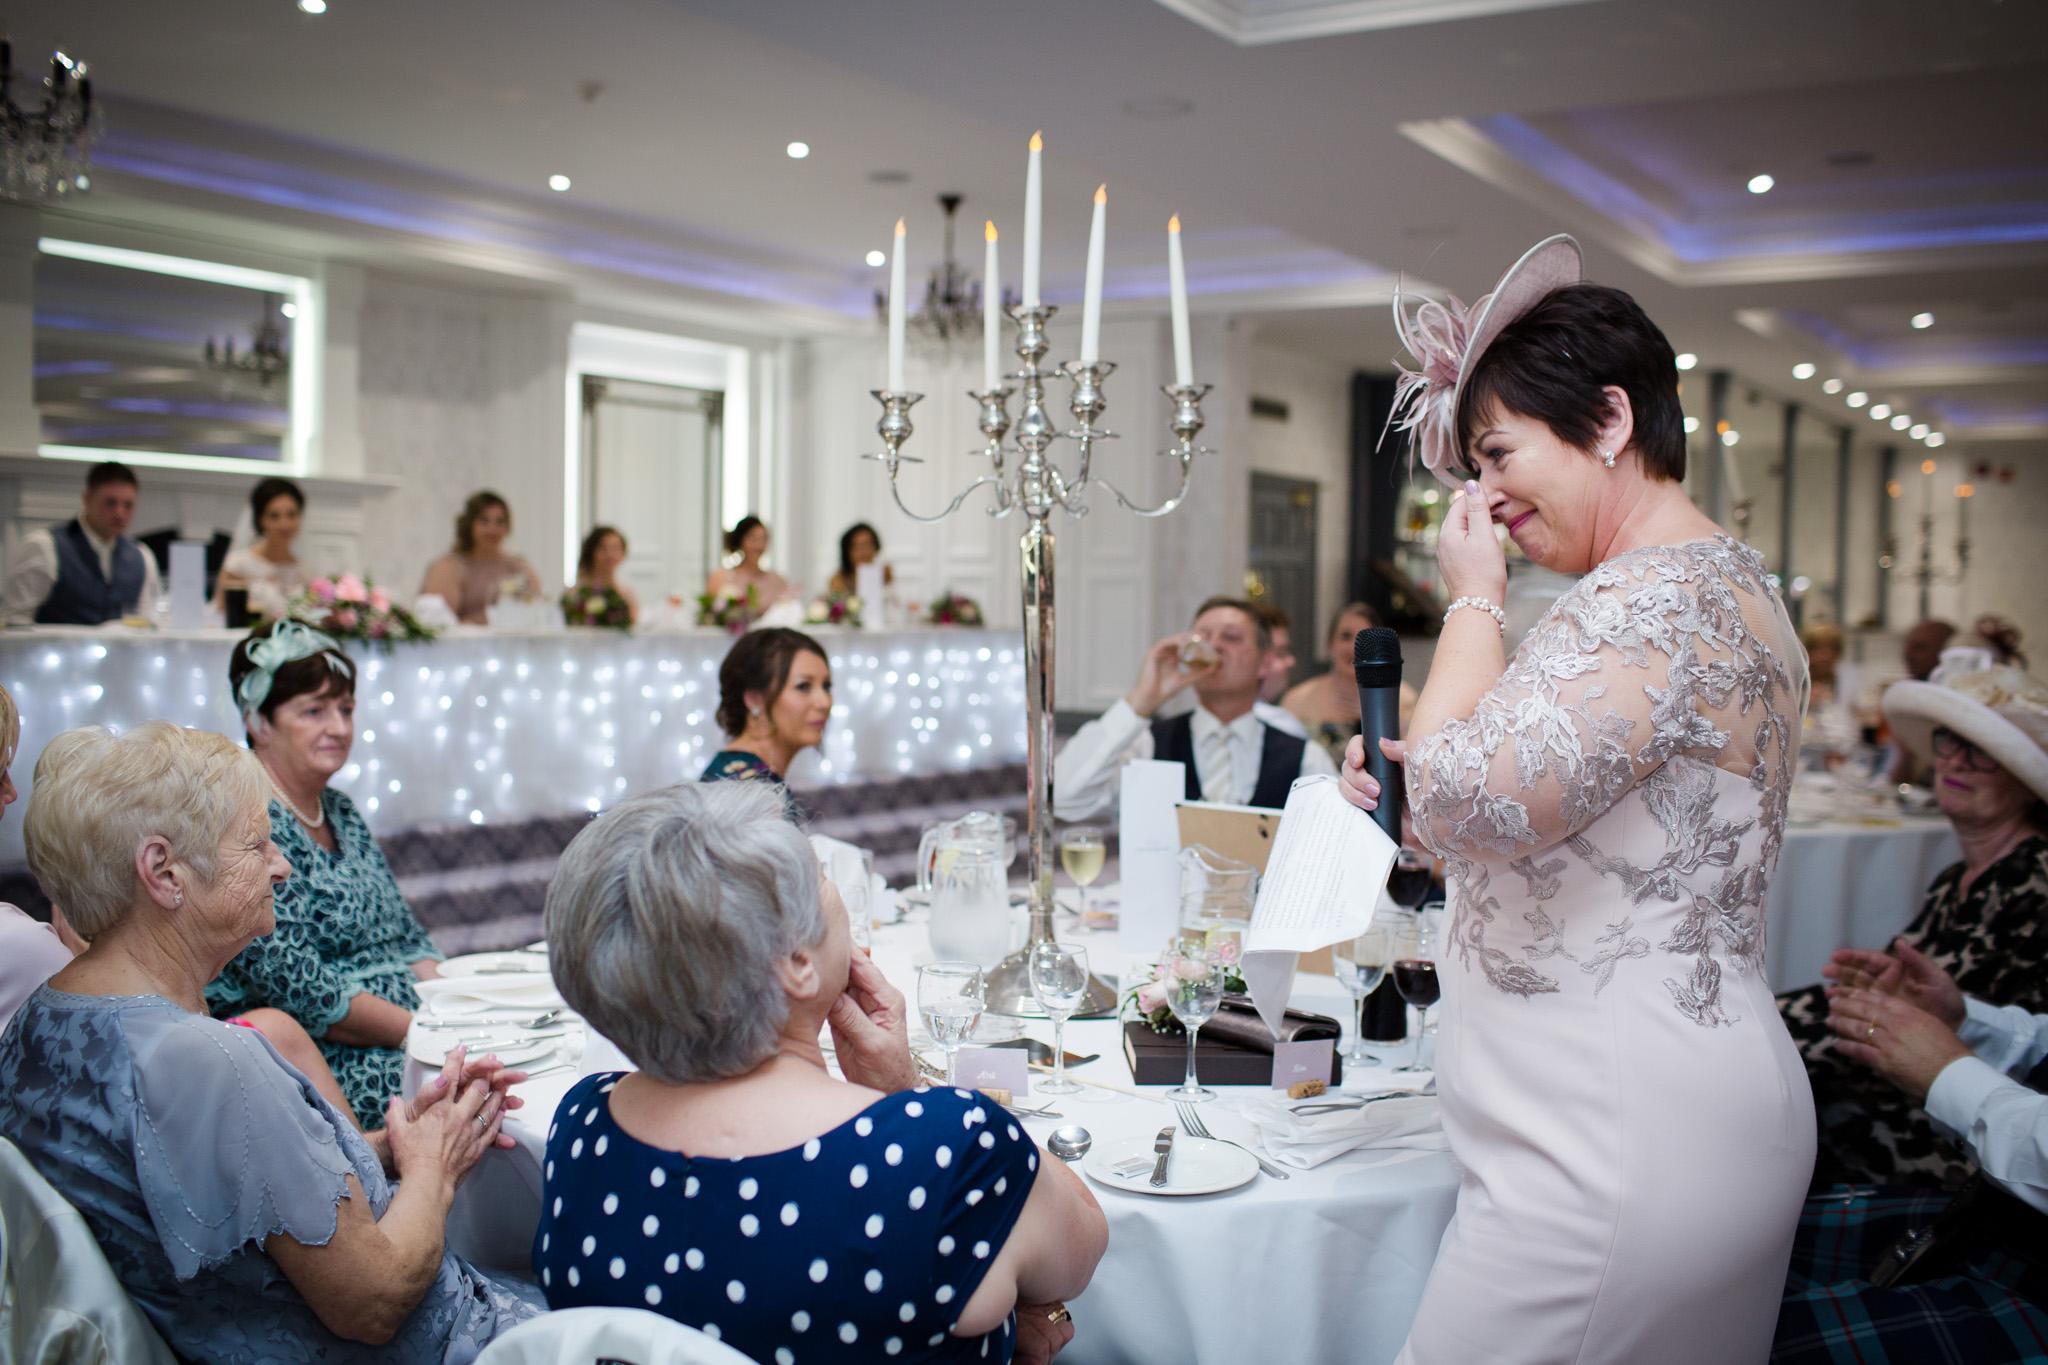 Mark_Barnes_Northern_Ireland_Wedding_Photography_Leighinmohr-house-hotel-ballymena_Wedding_Photography-56.jpg